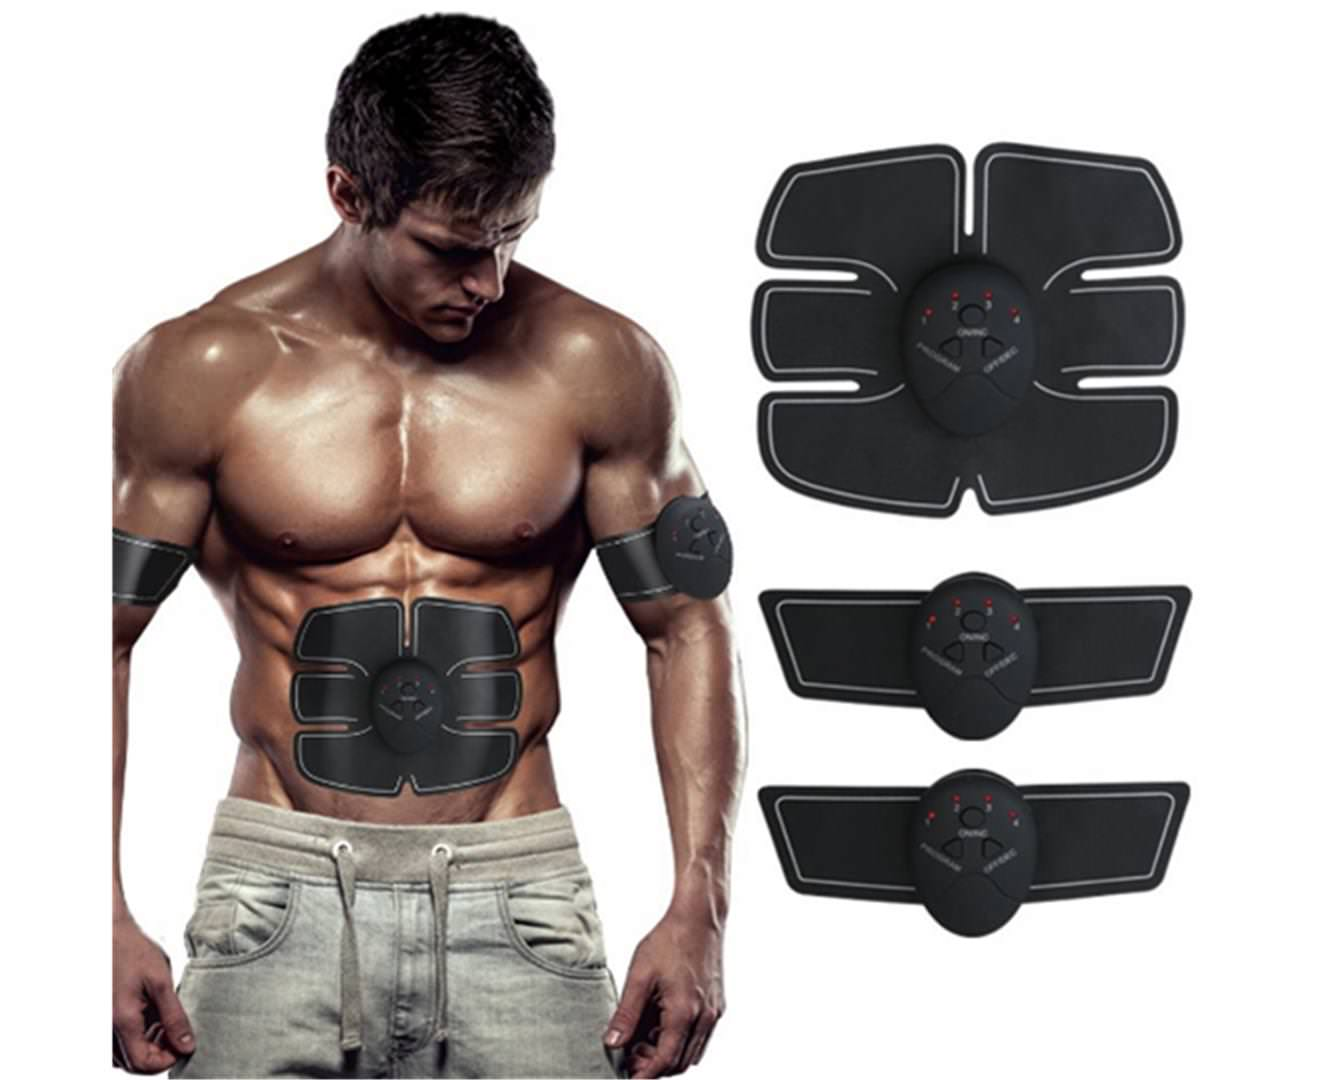 Muscle Trainer Wireless Body Gym Workout Fitness Equipment for Abdomen Training Men & Women